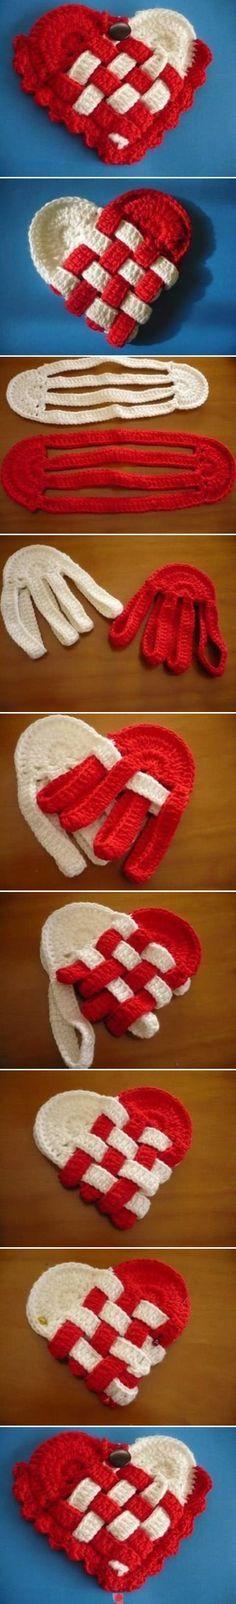 crochet Danish heart baskets